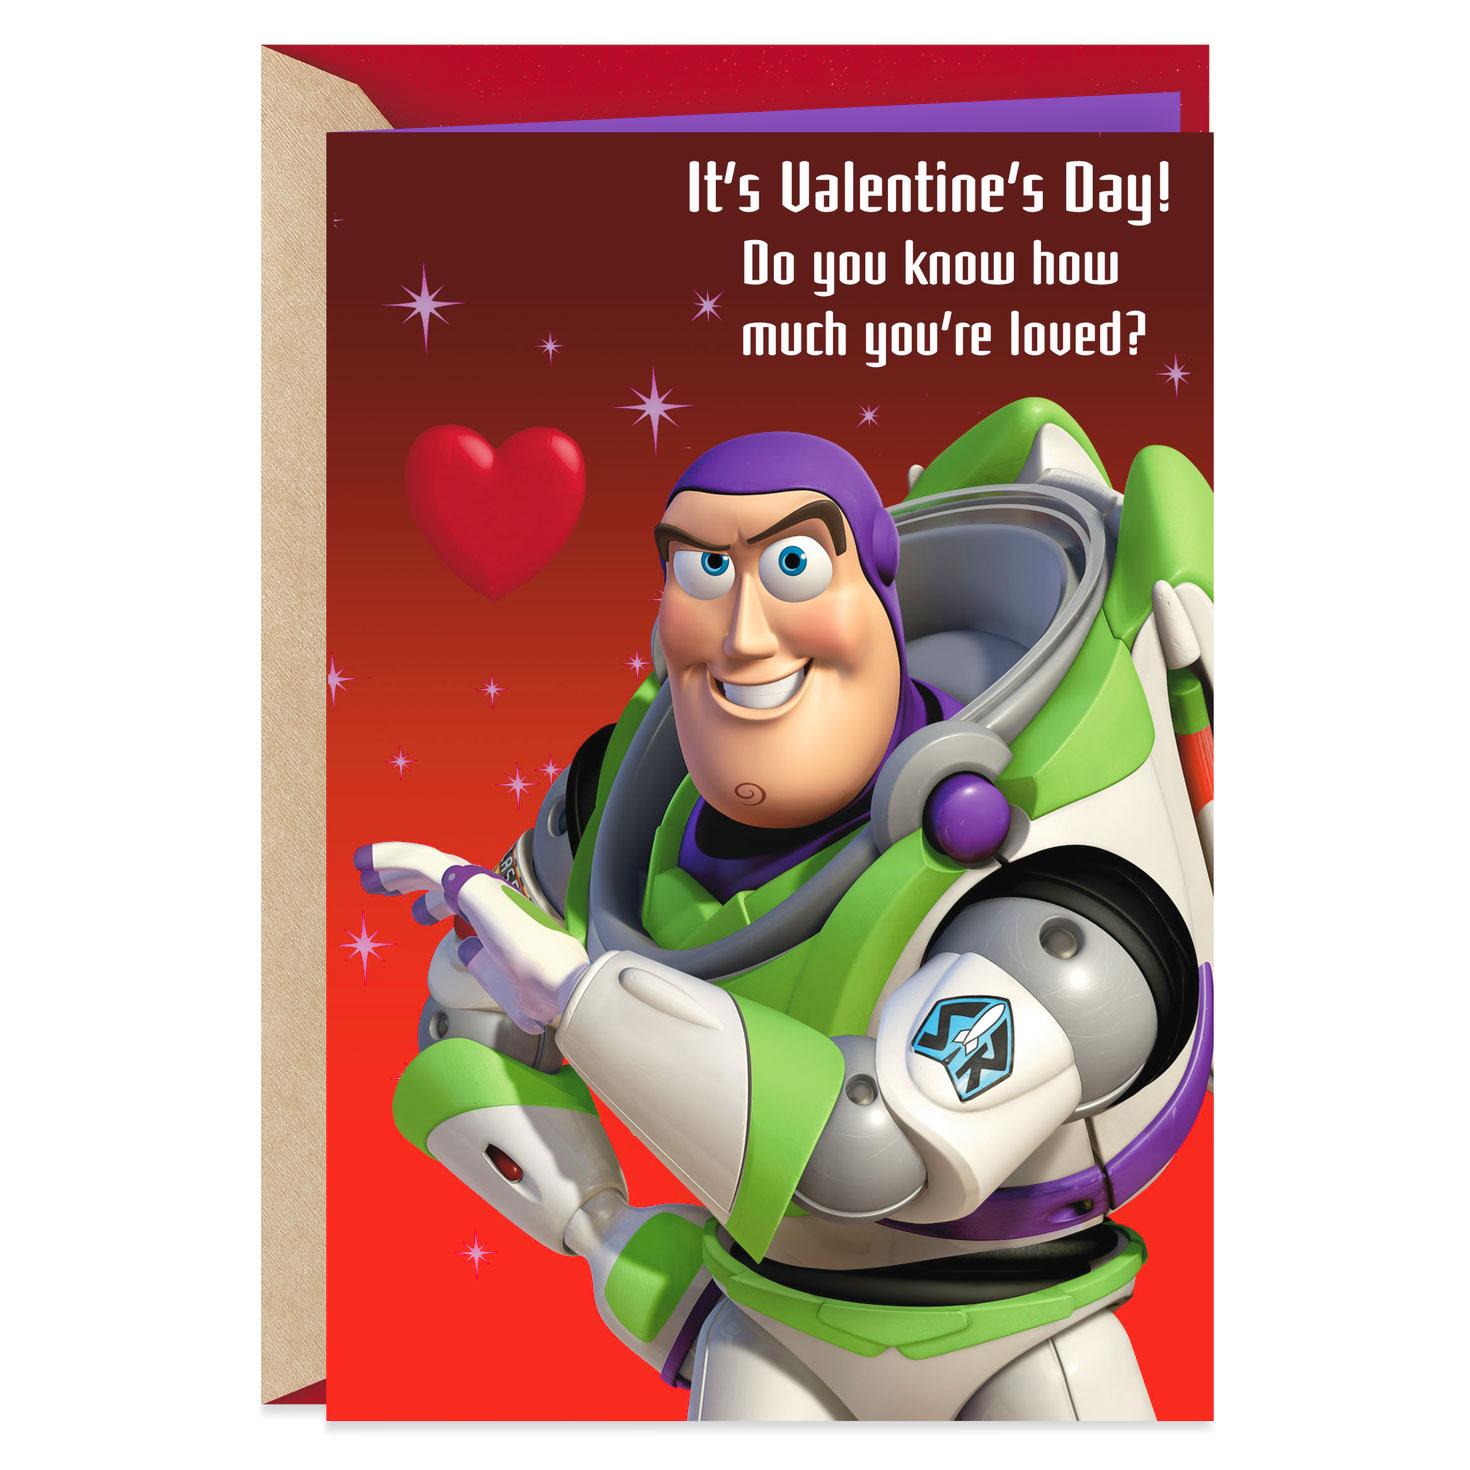 Disney/Pixar Toy Story Buzz Lightyear You're Loved